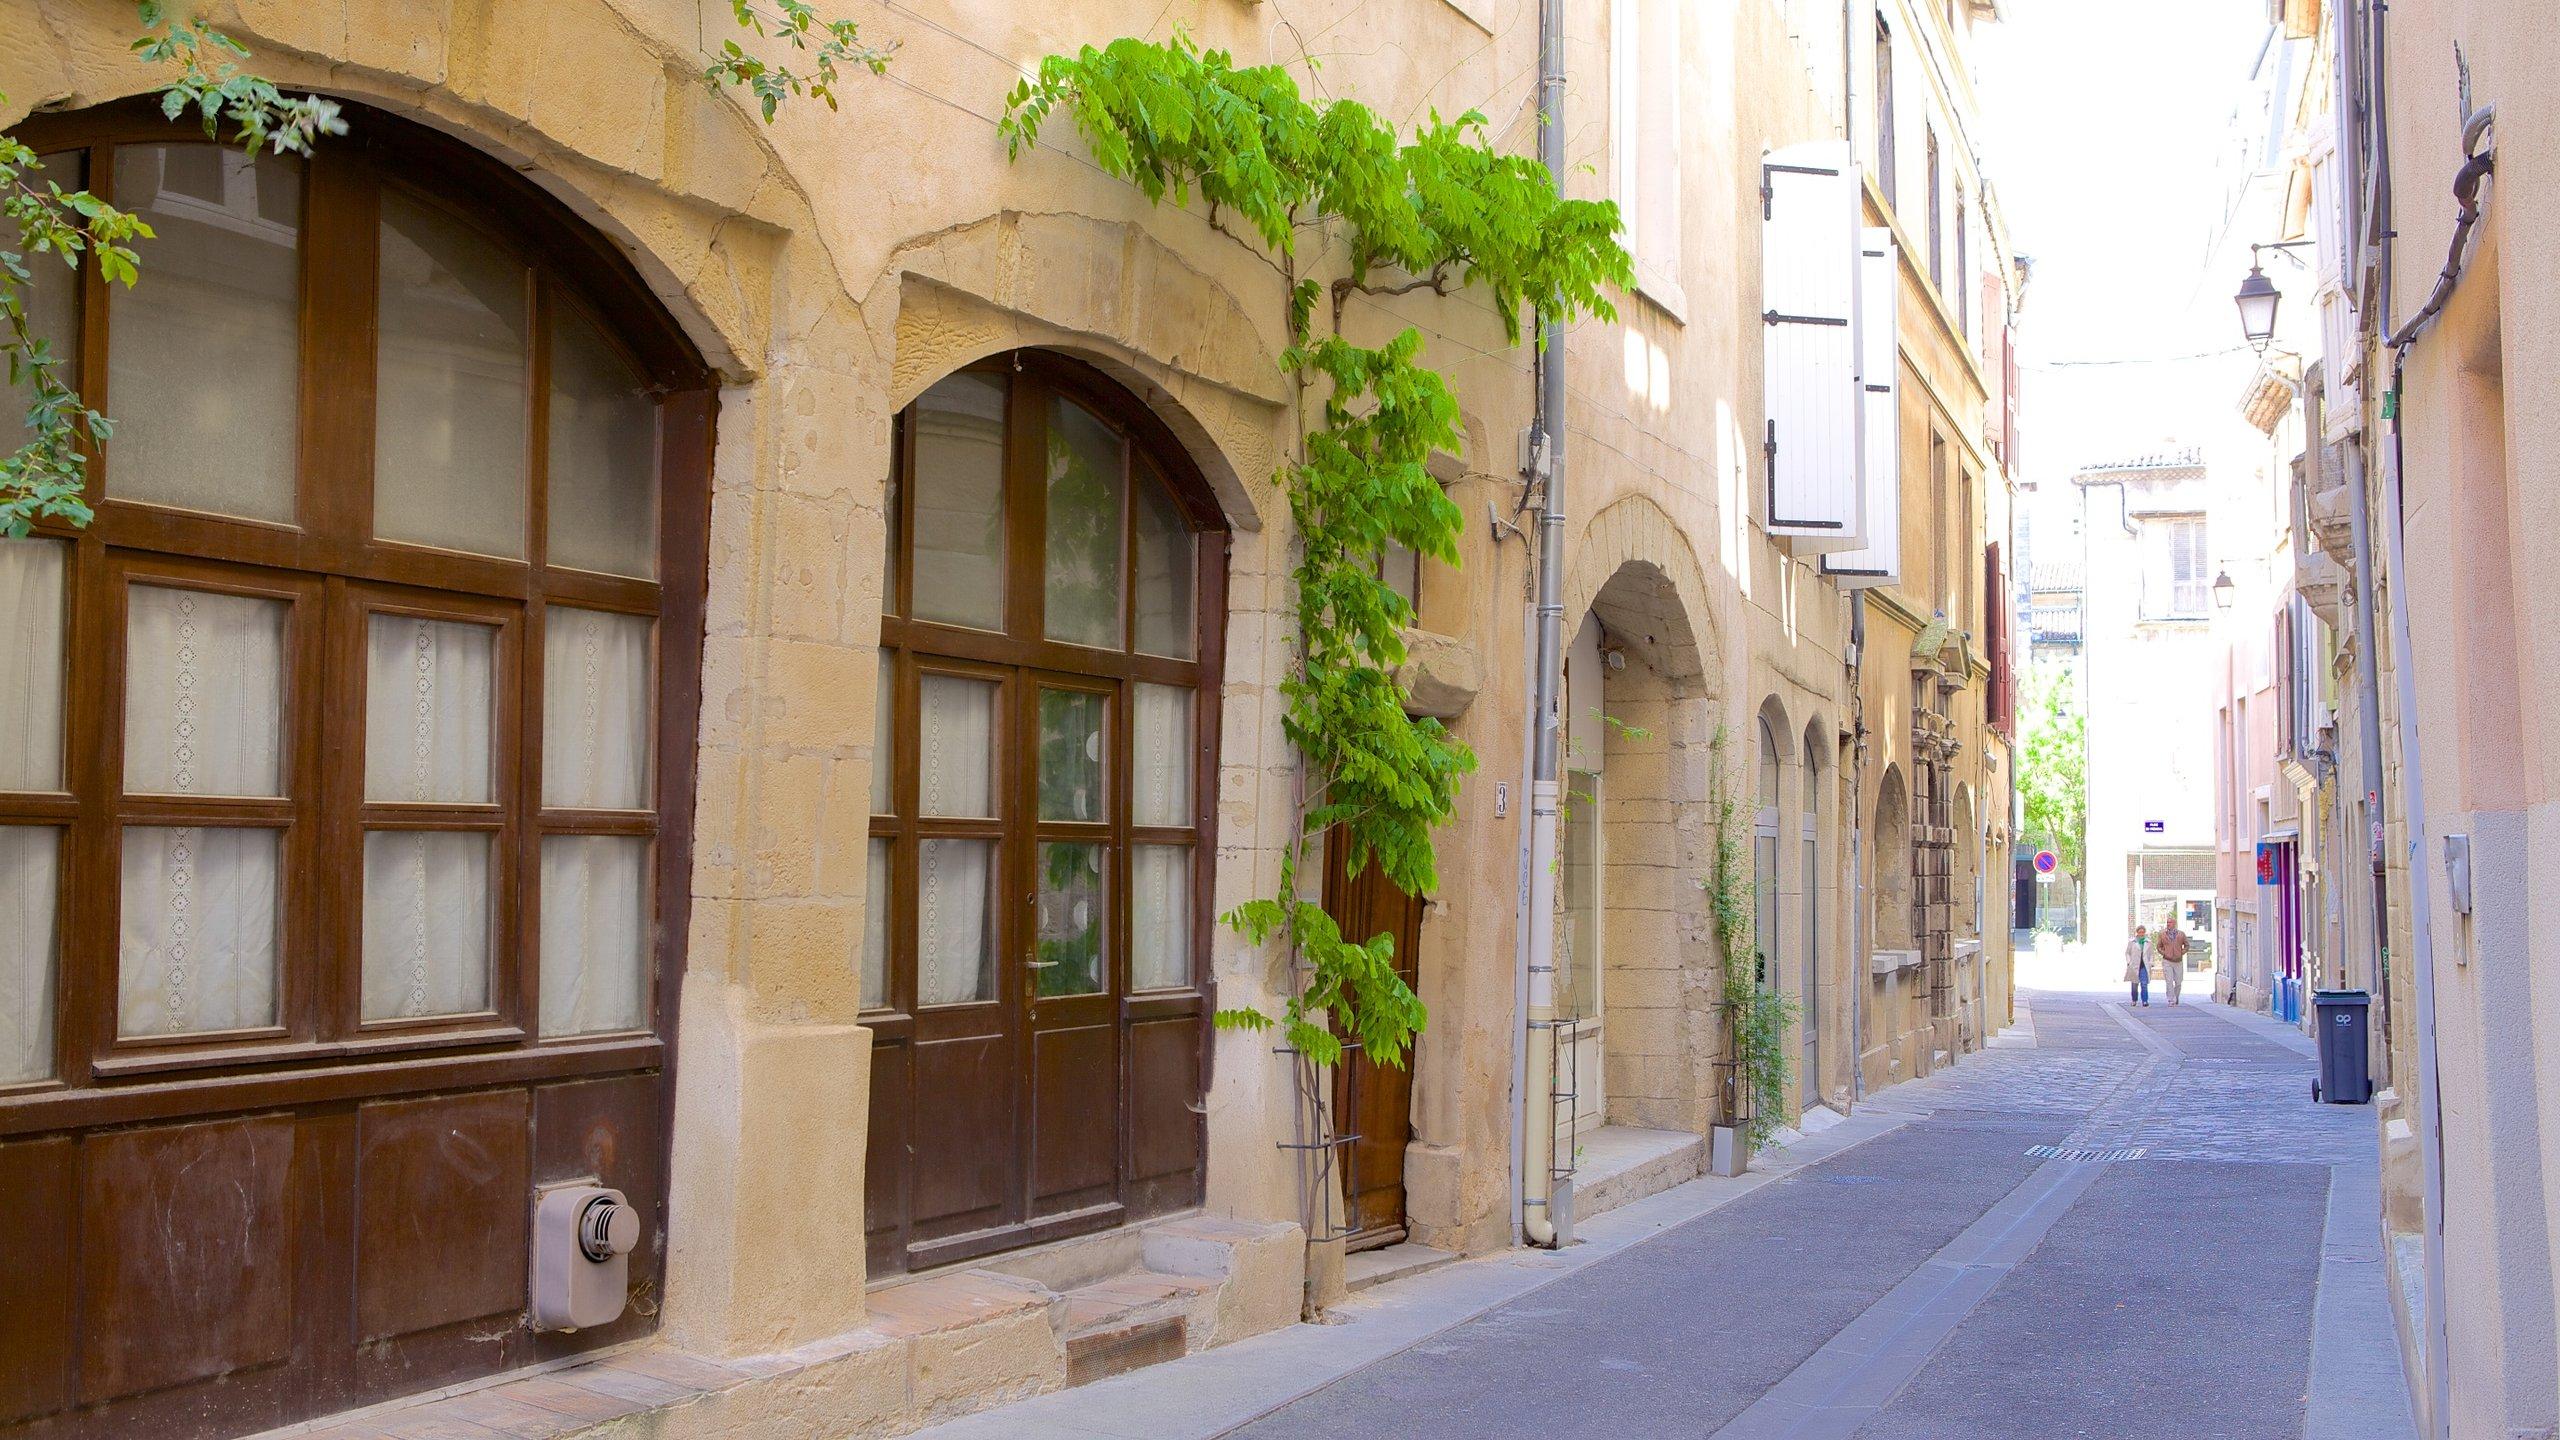 Drome, France